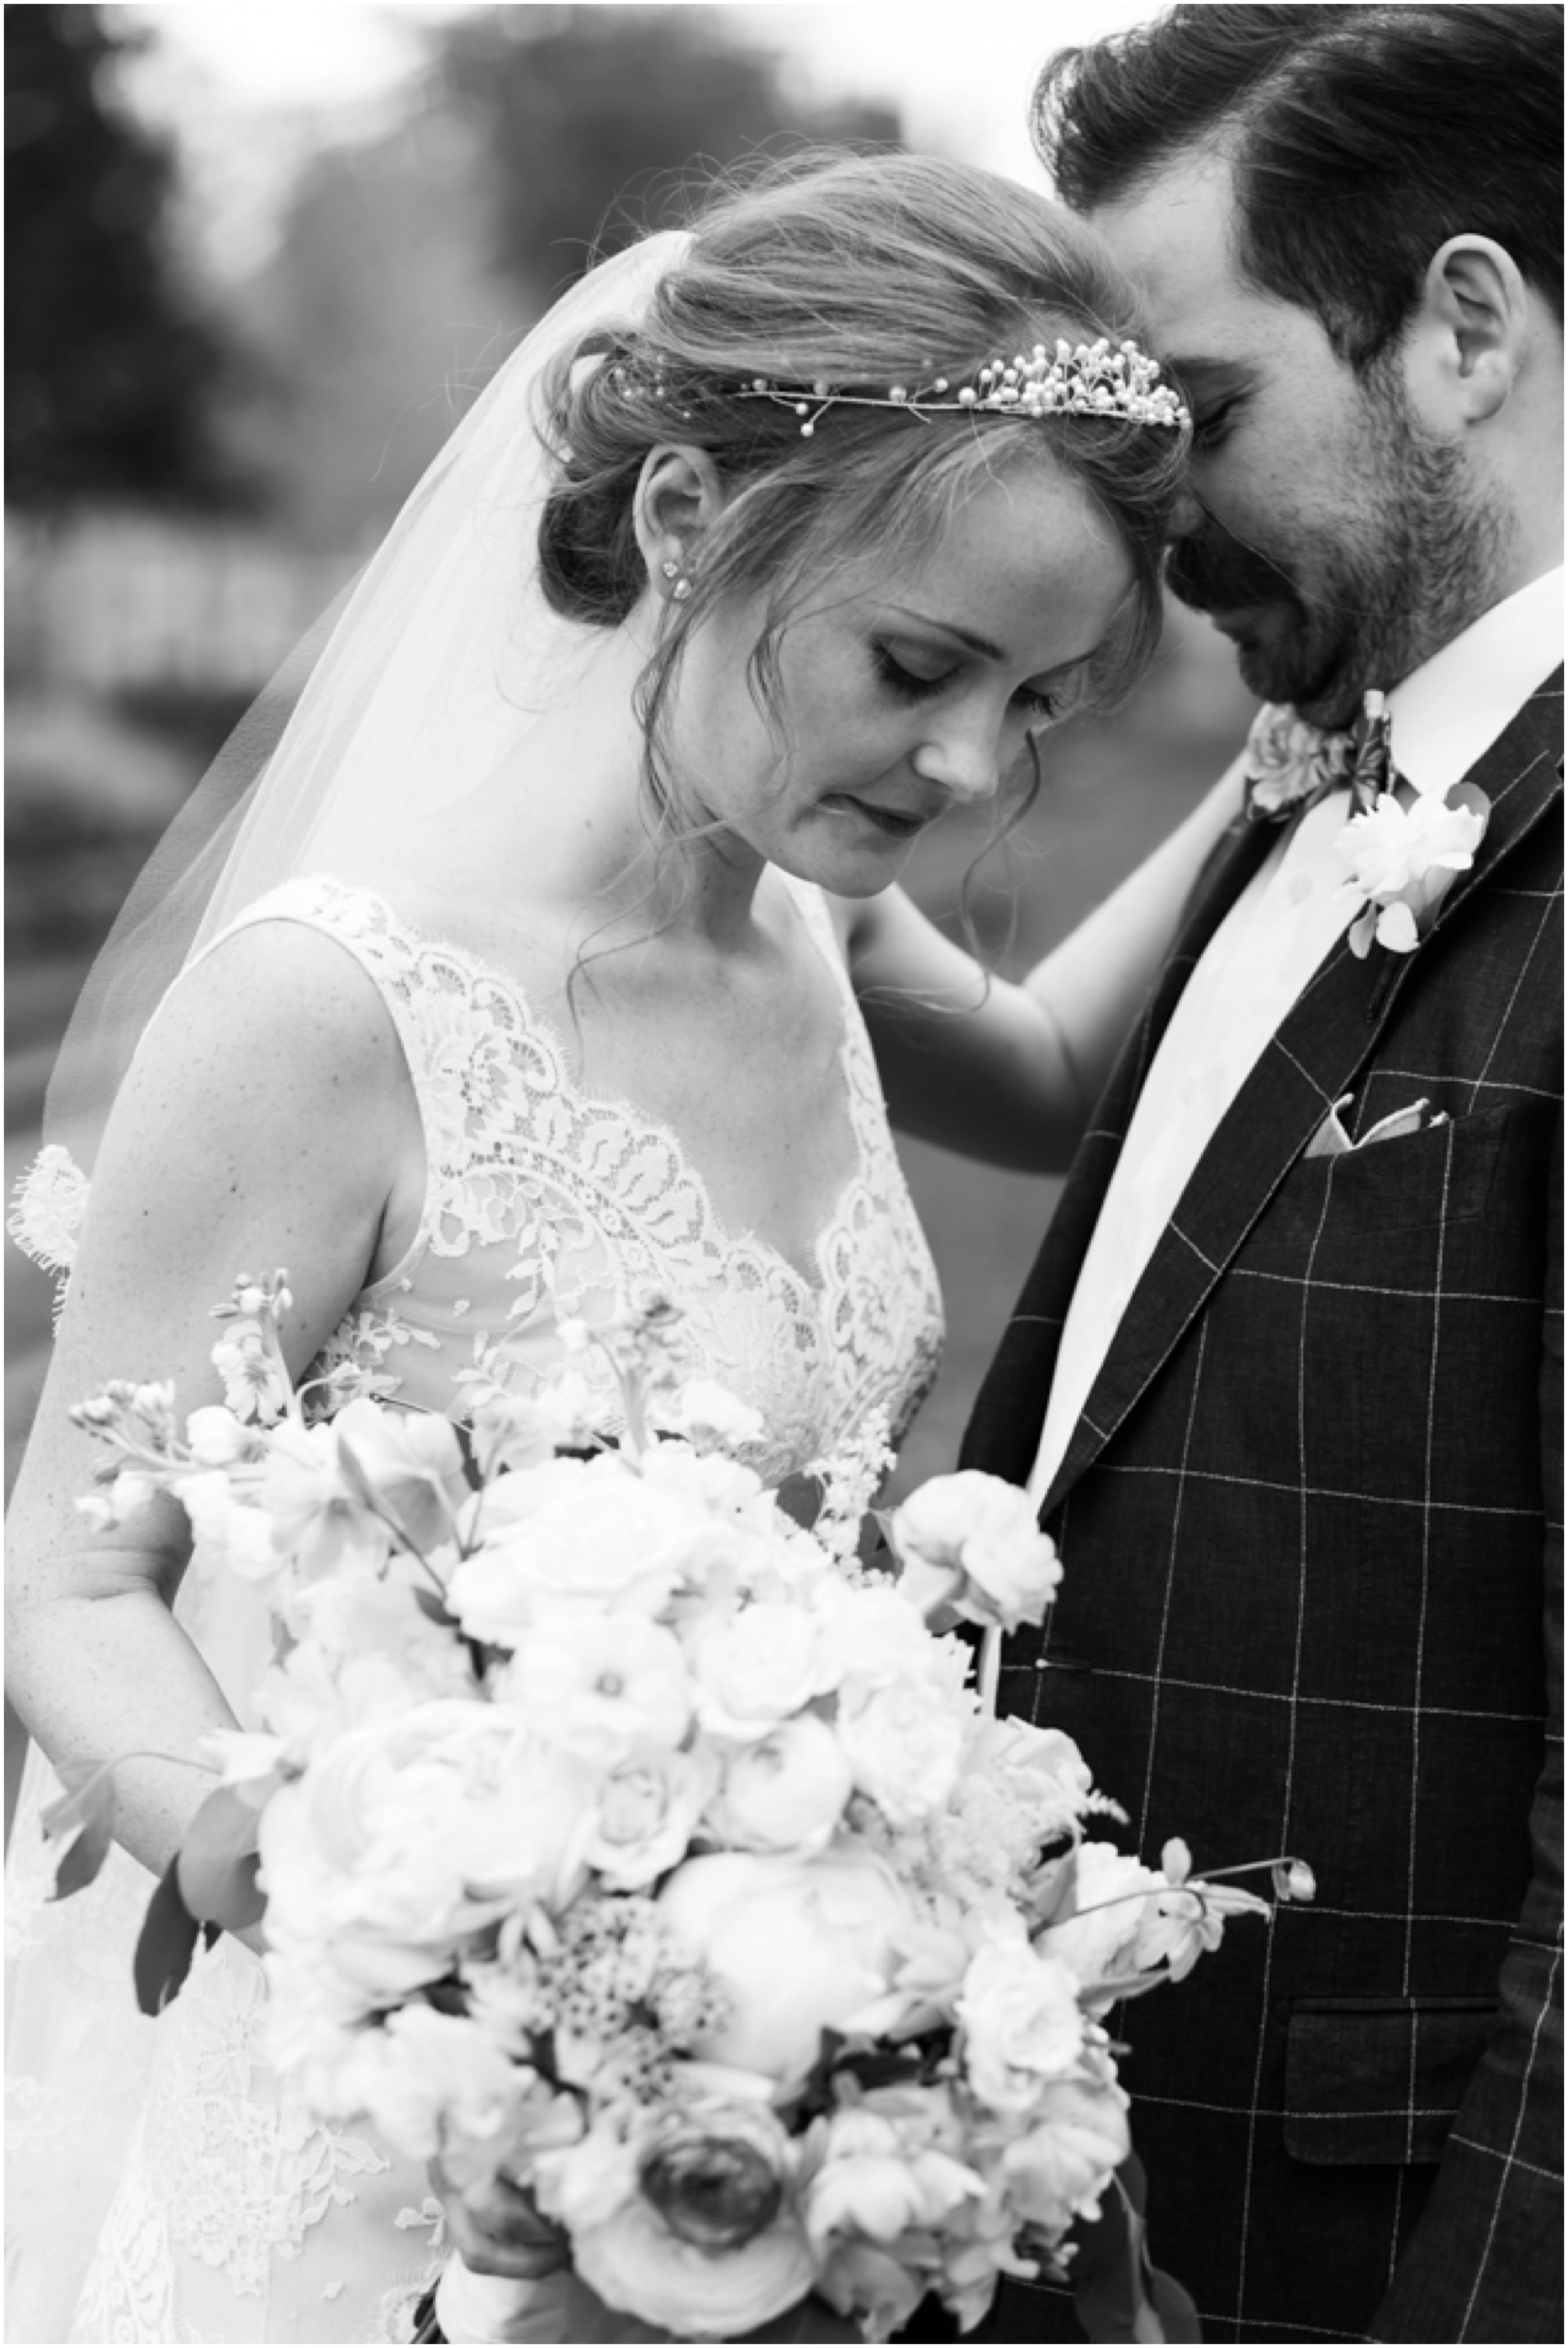 Jon + Kristina Wedding (Selena Phillips-Boyle) 3.jpg